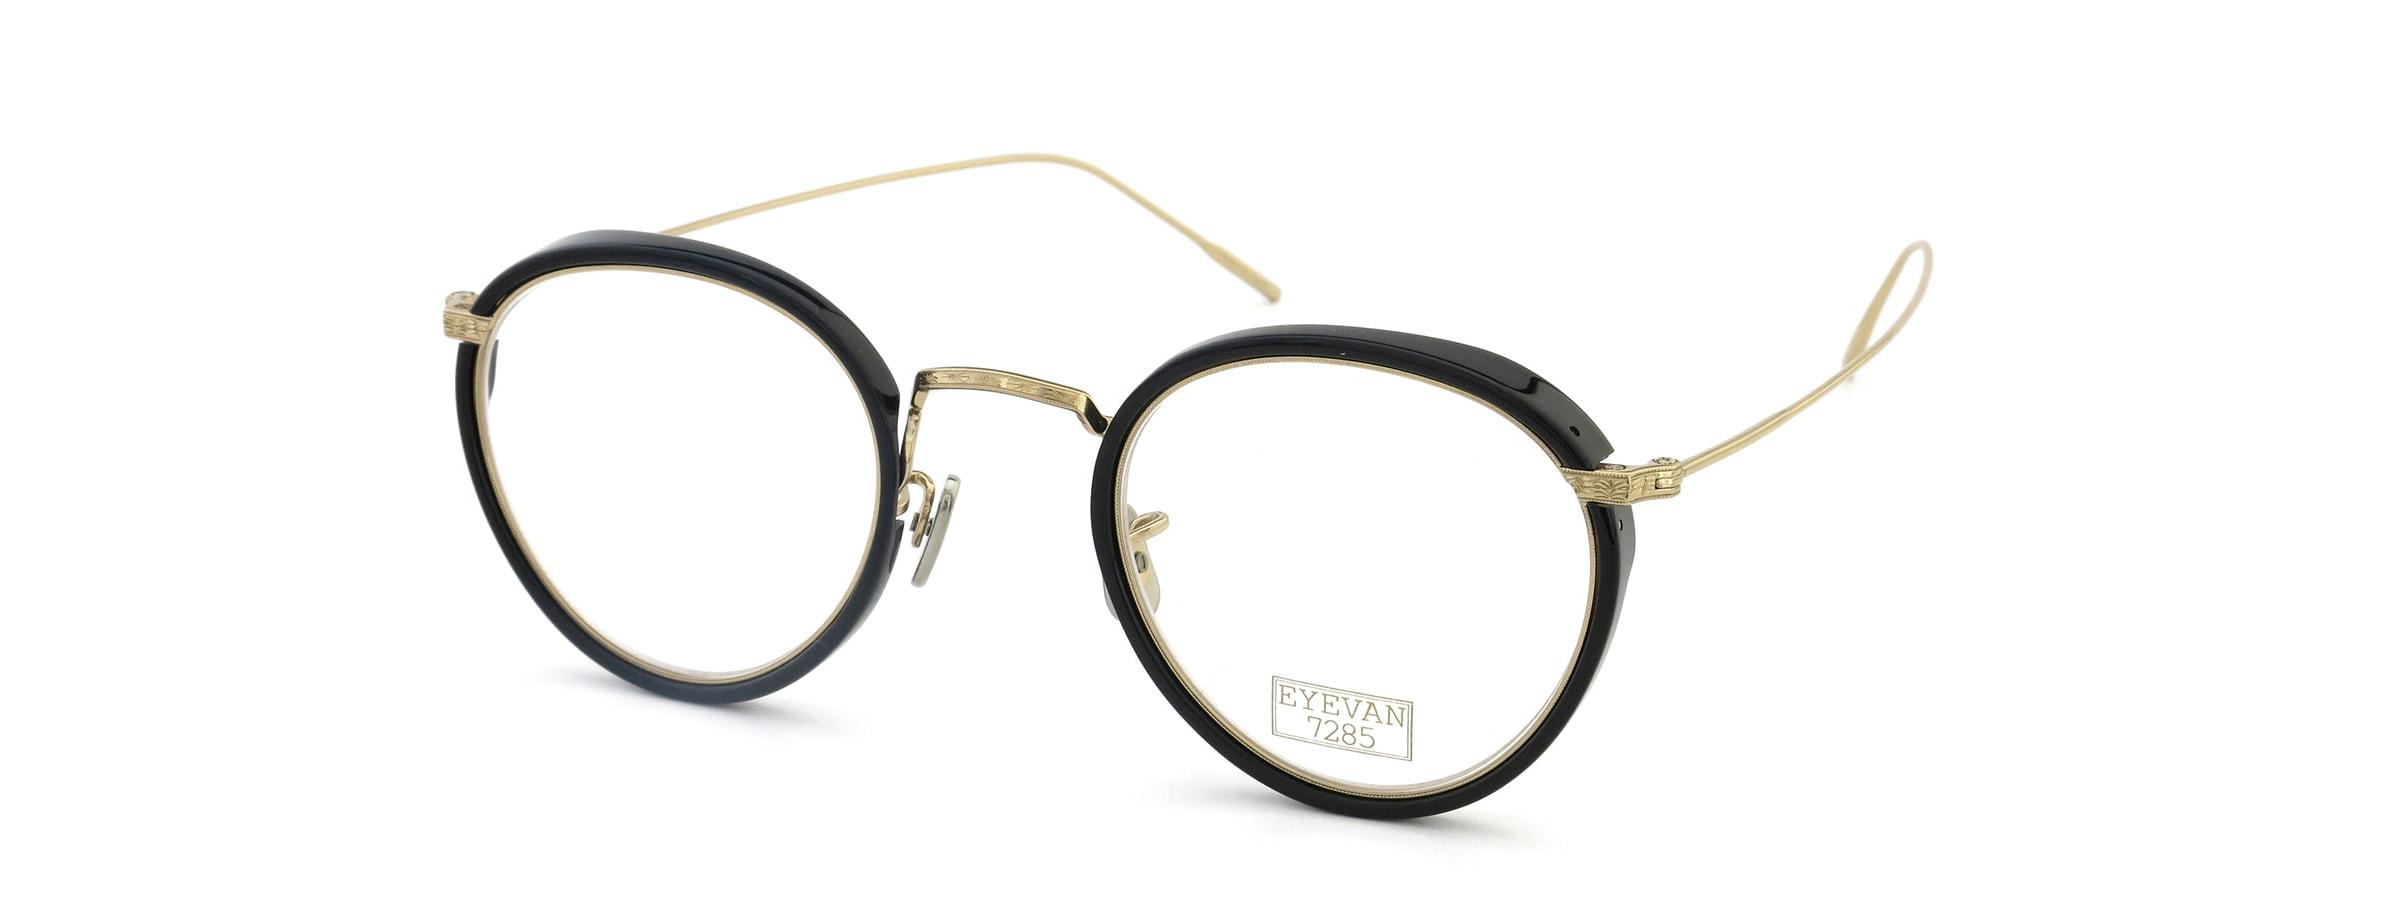 EYEVAN 7285 553 1002 BLACK/EYEVAN GOLD